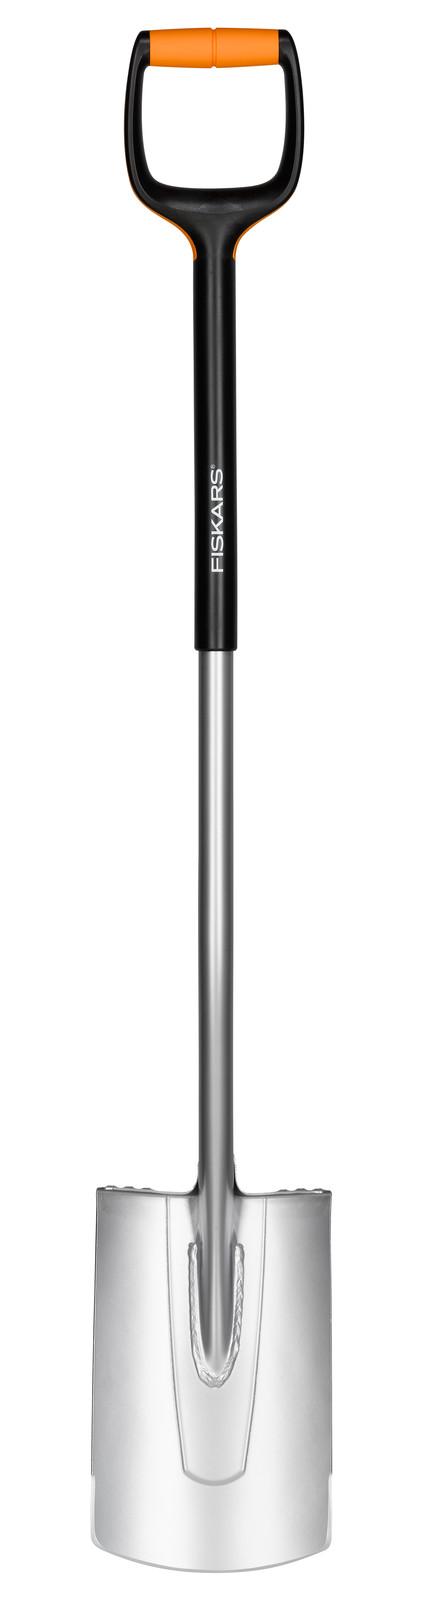 Fiskars Лопата прямая с закругленным лезвием Xact L,  1200 см, 1900г